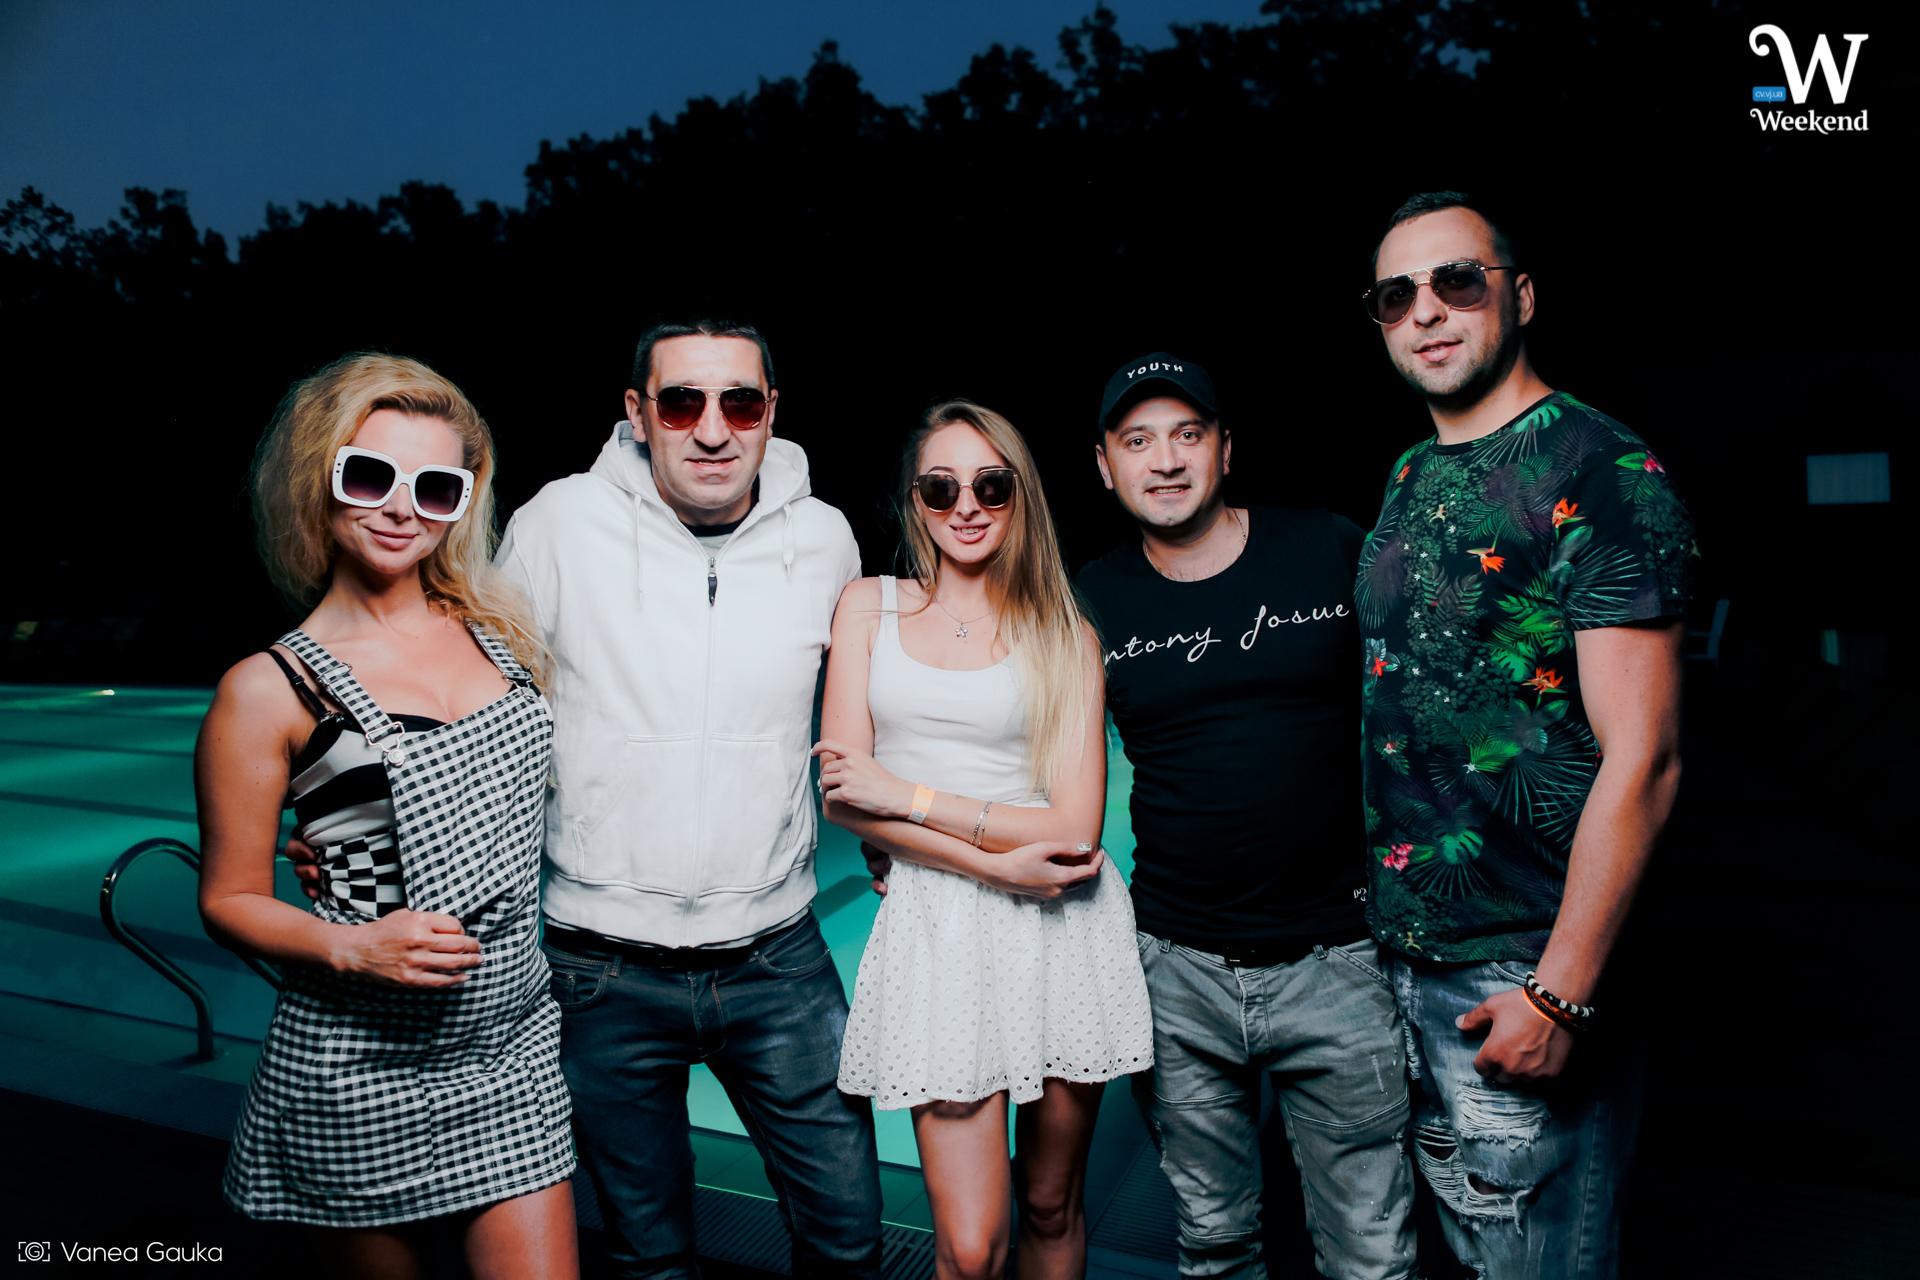 Weekend birthday pool-party в Георг парк 2 ЧАСТИНА